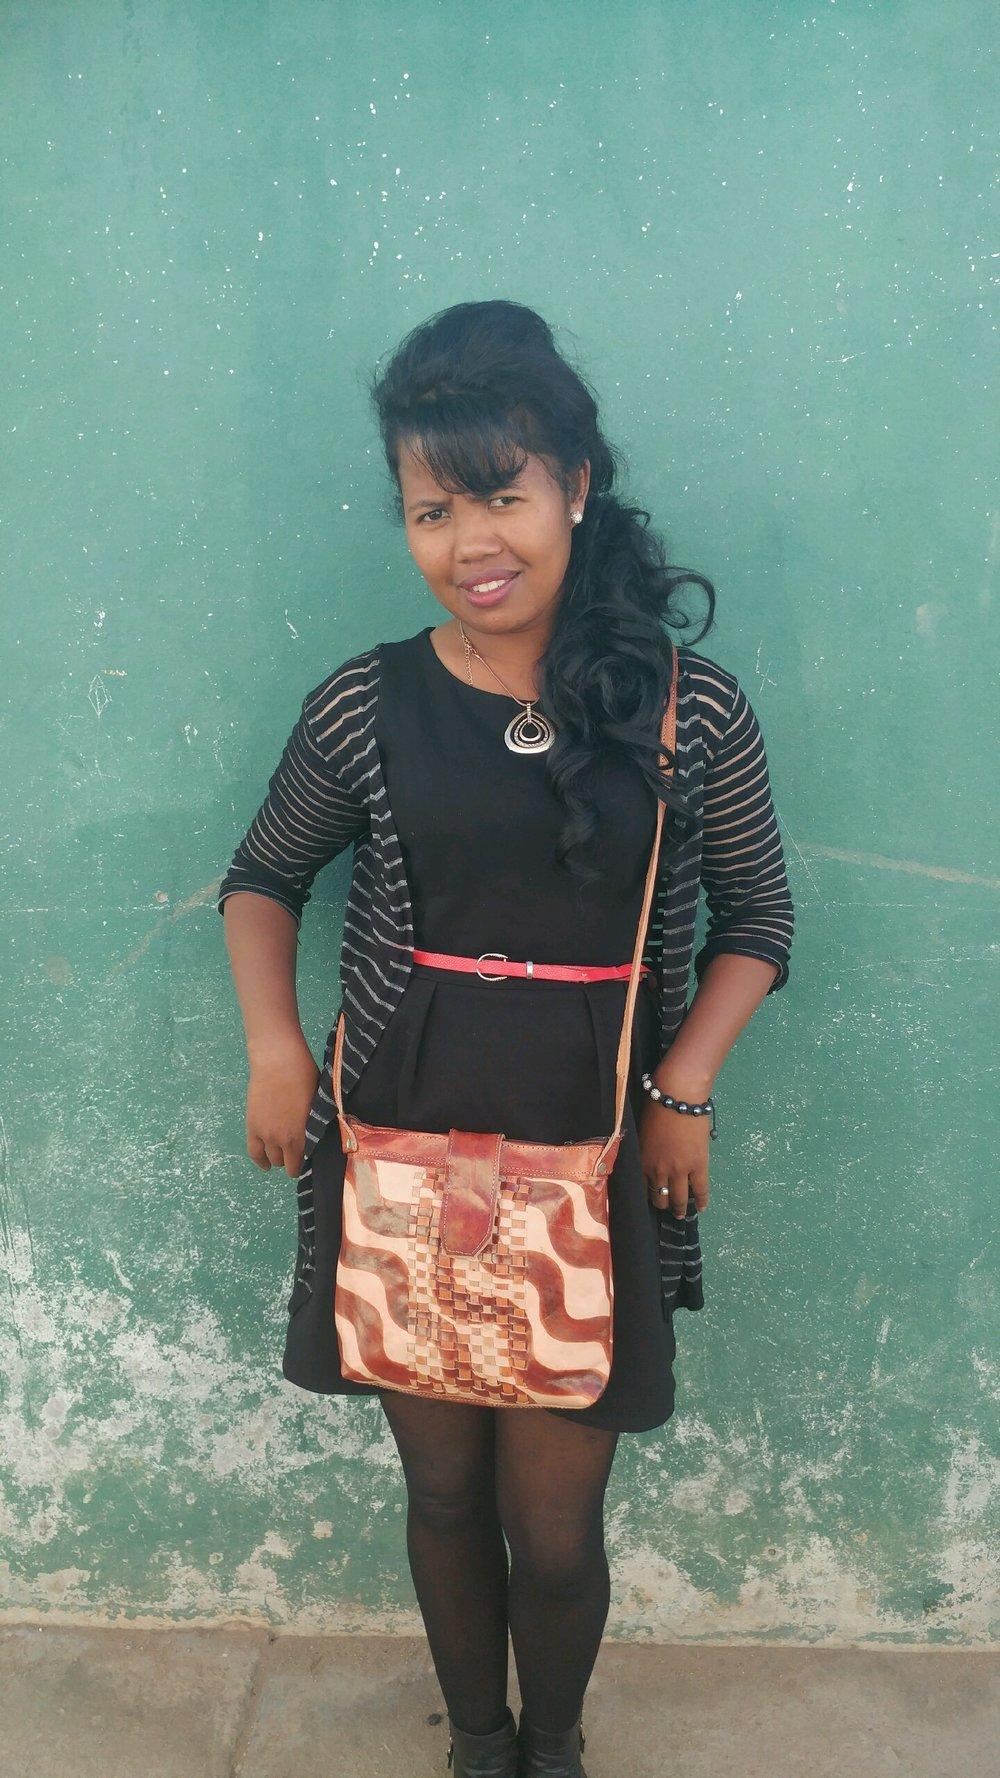 Mialy